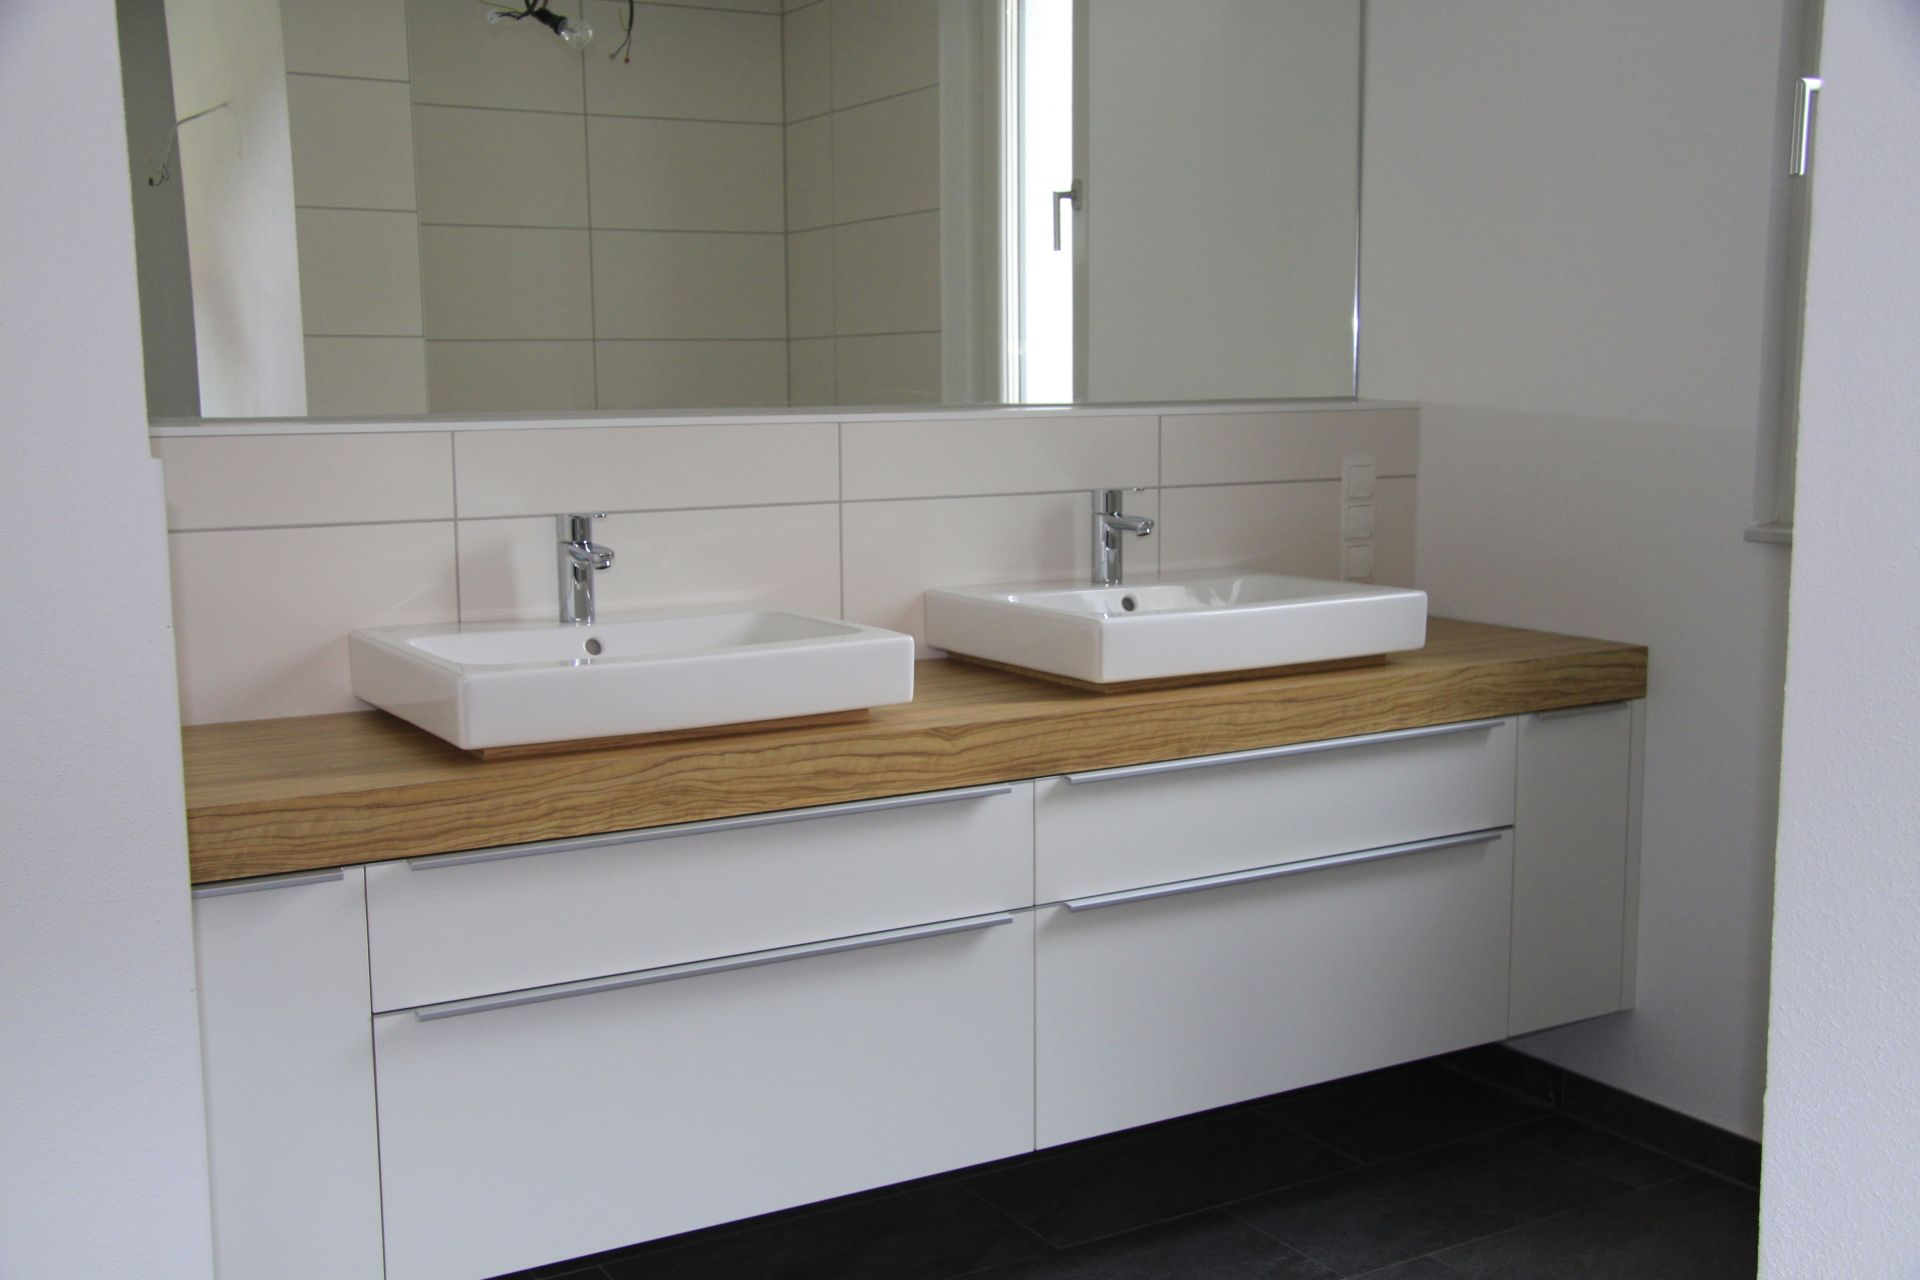 gro er spiegel gro e fliesen. Black Bedroom Furniture Sets. Home Design Ideas